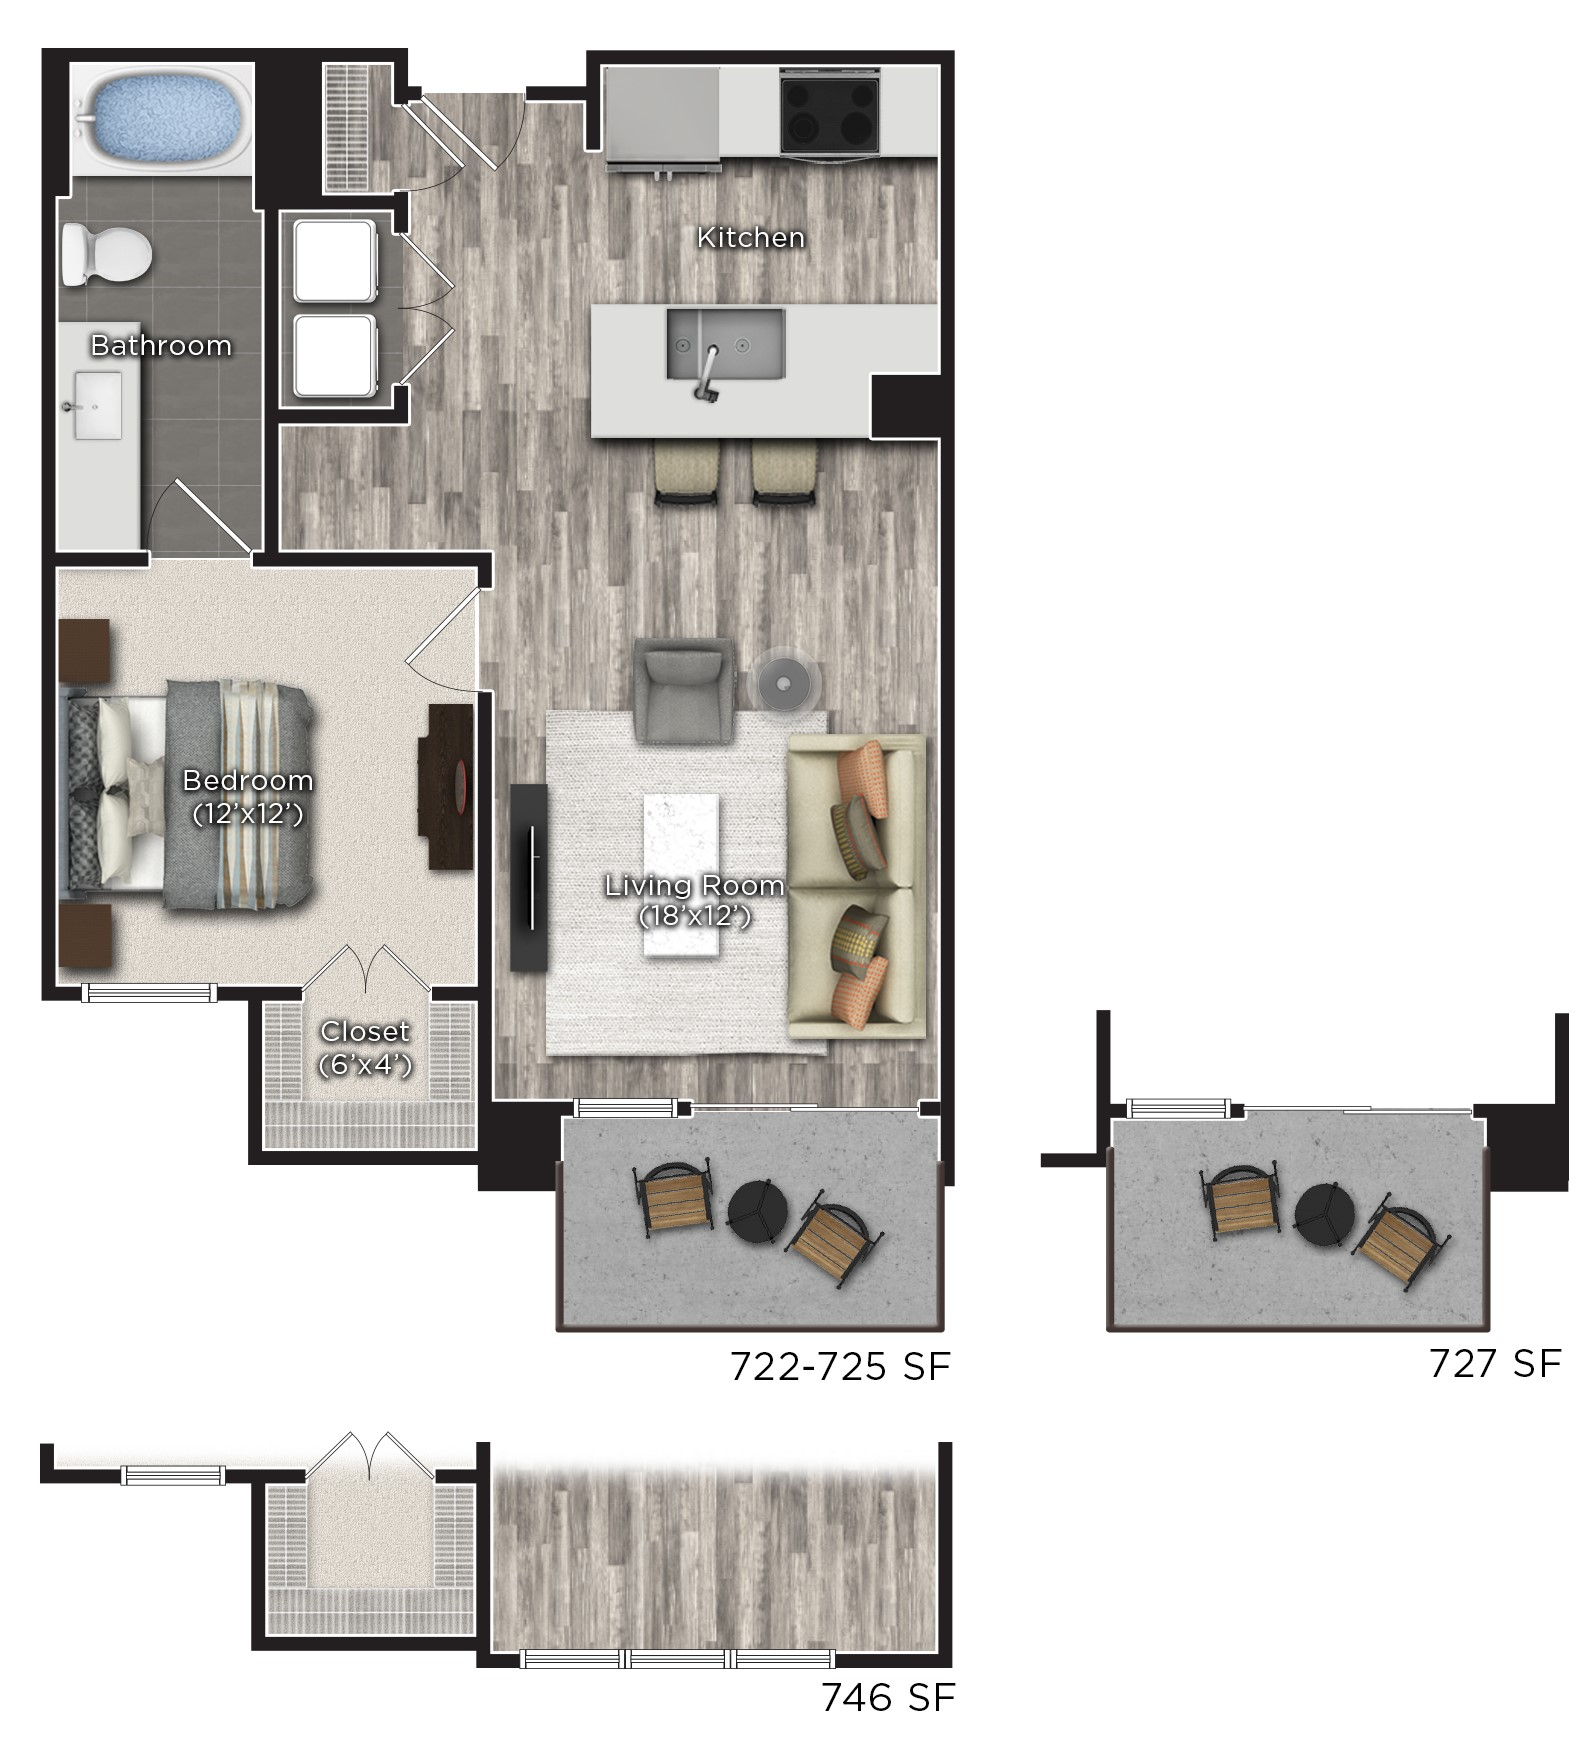 Floorplan - C image